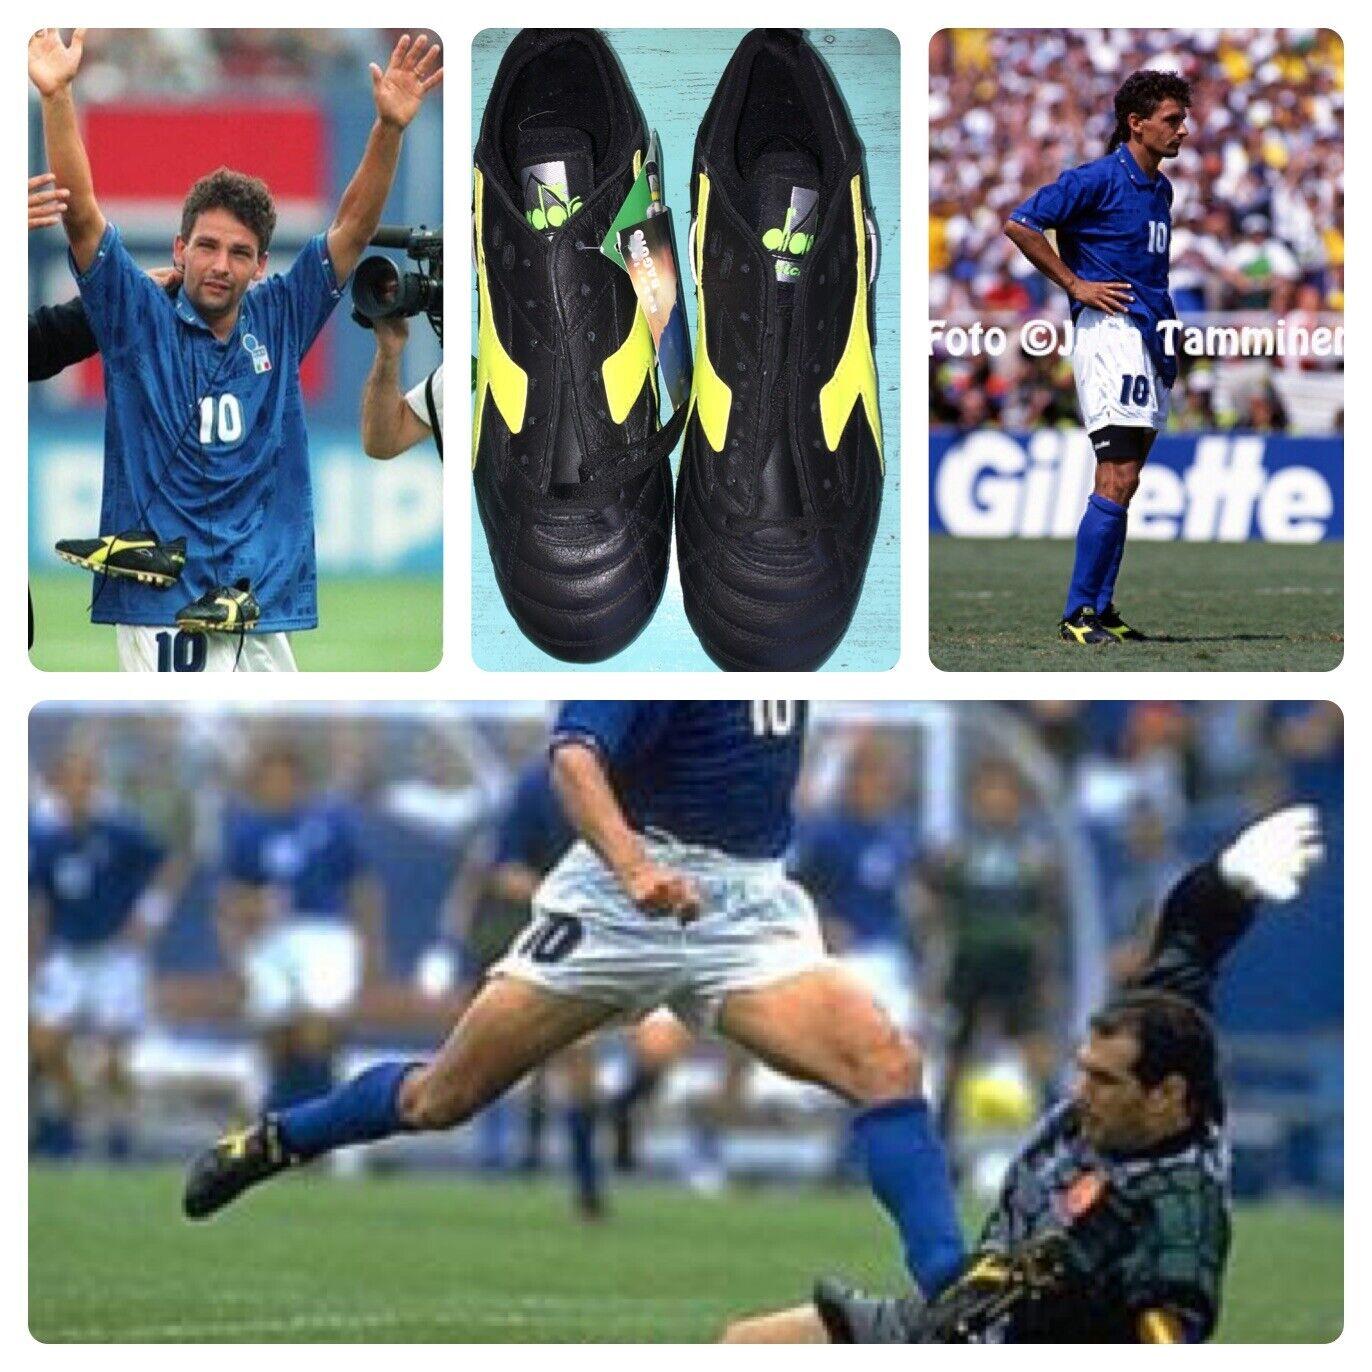 Diadora VTG Baggio Match SG Winner Made In  Soccer Cleats schuhe 7.5